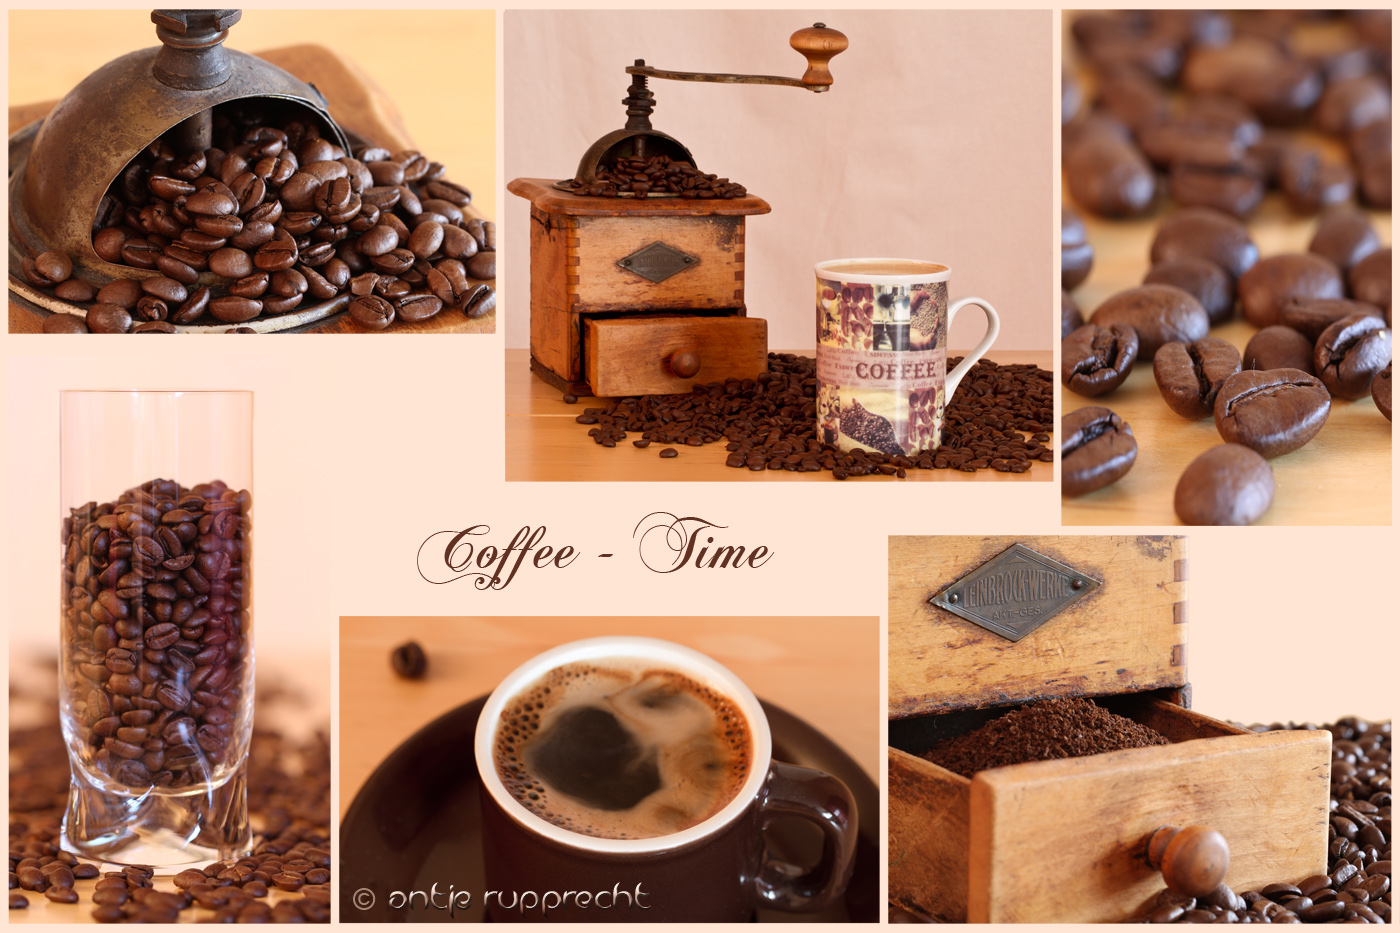 Coffee - Time